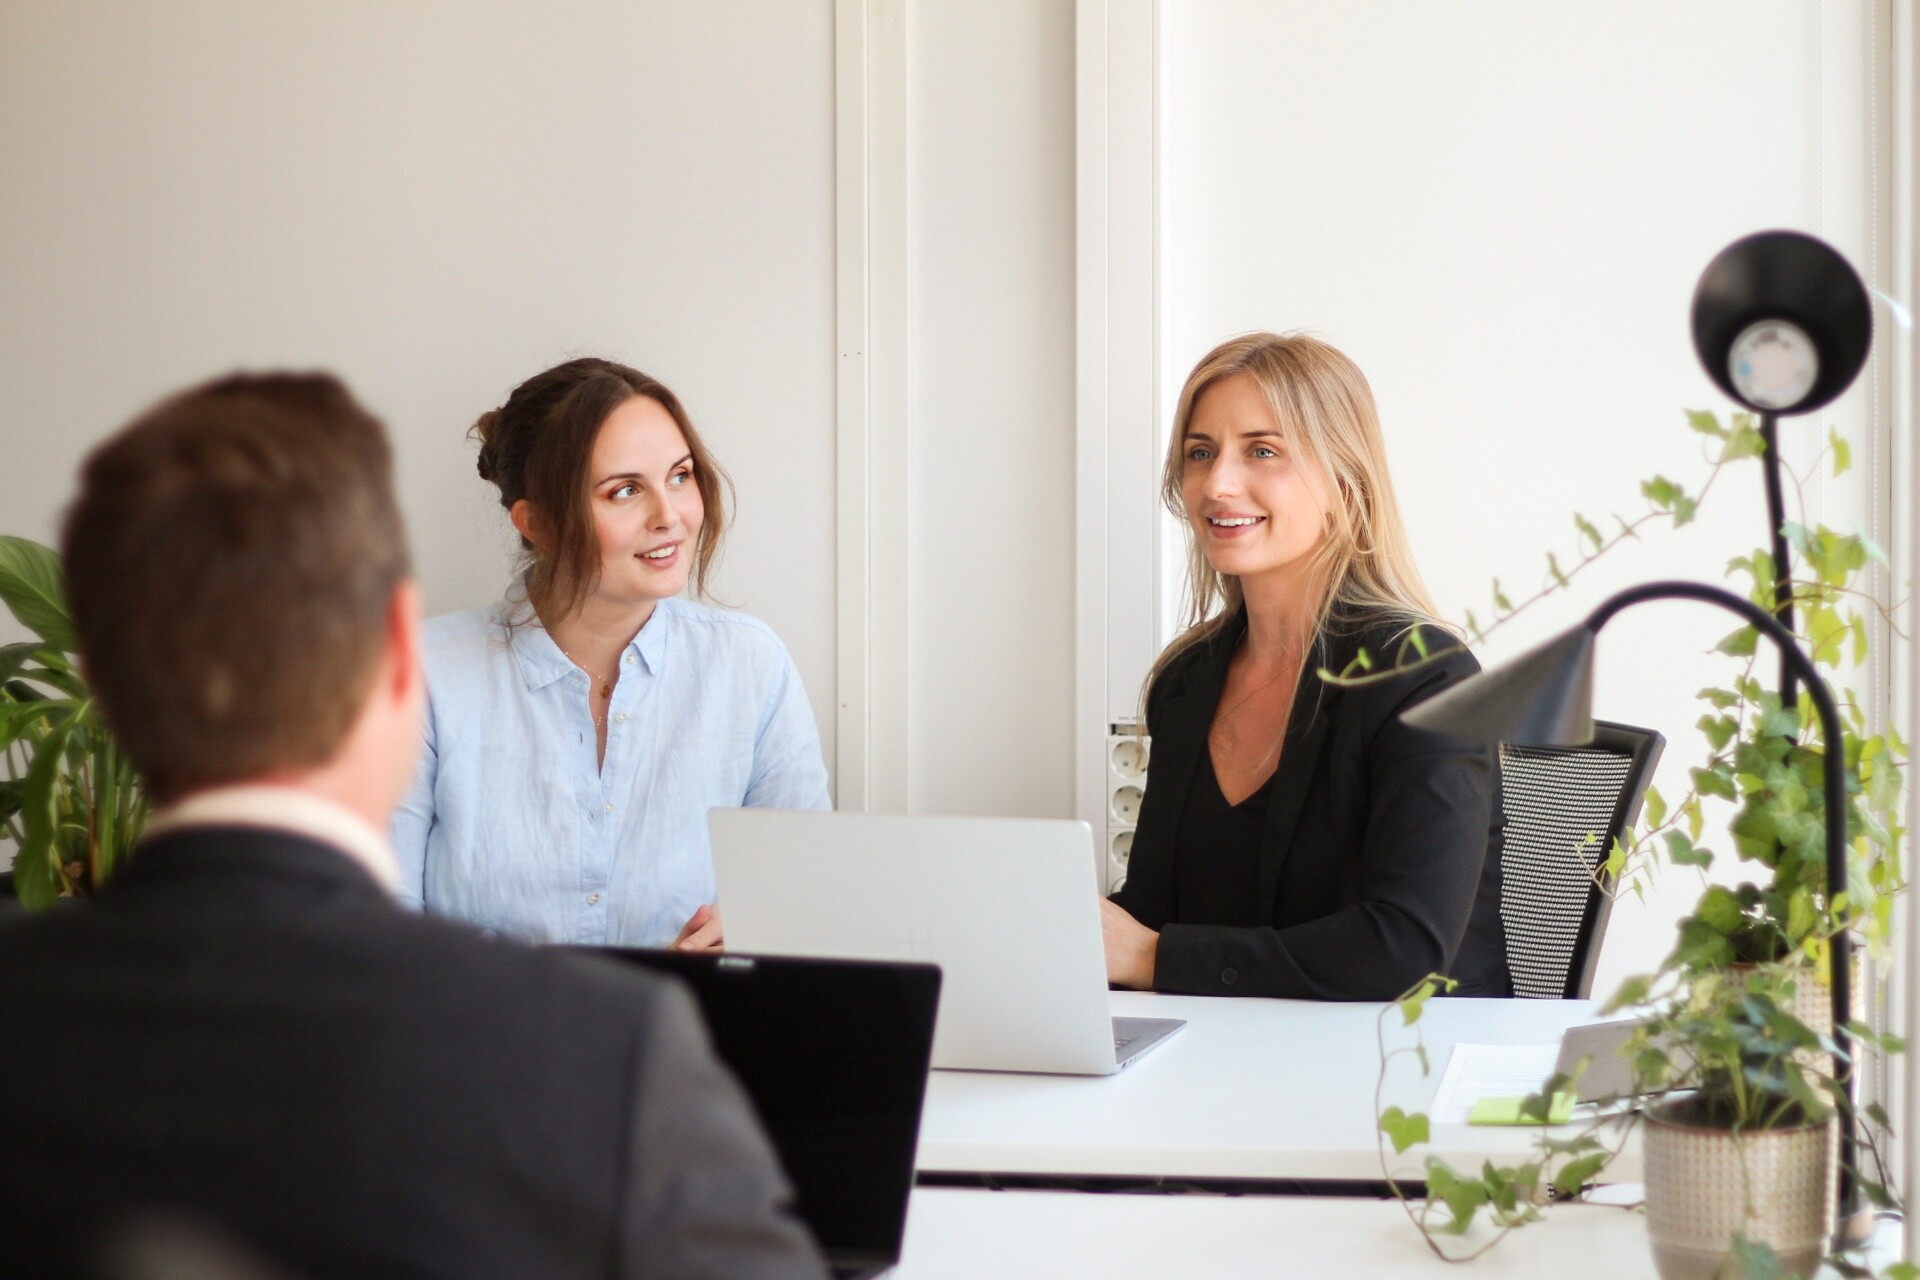 Ditt team består av erfarna personer inom service management